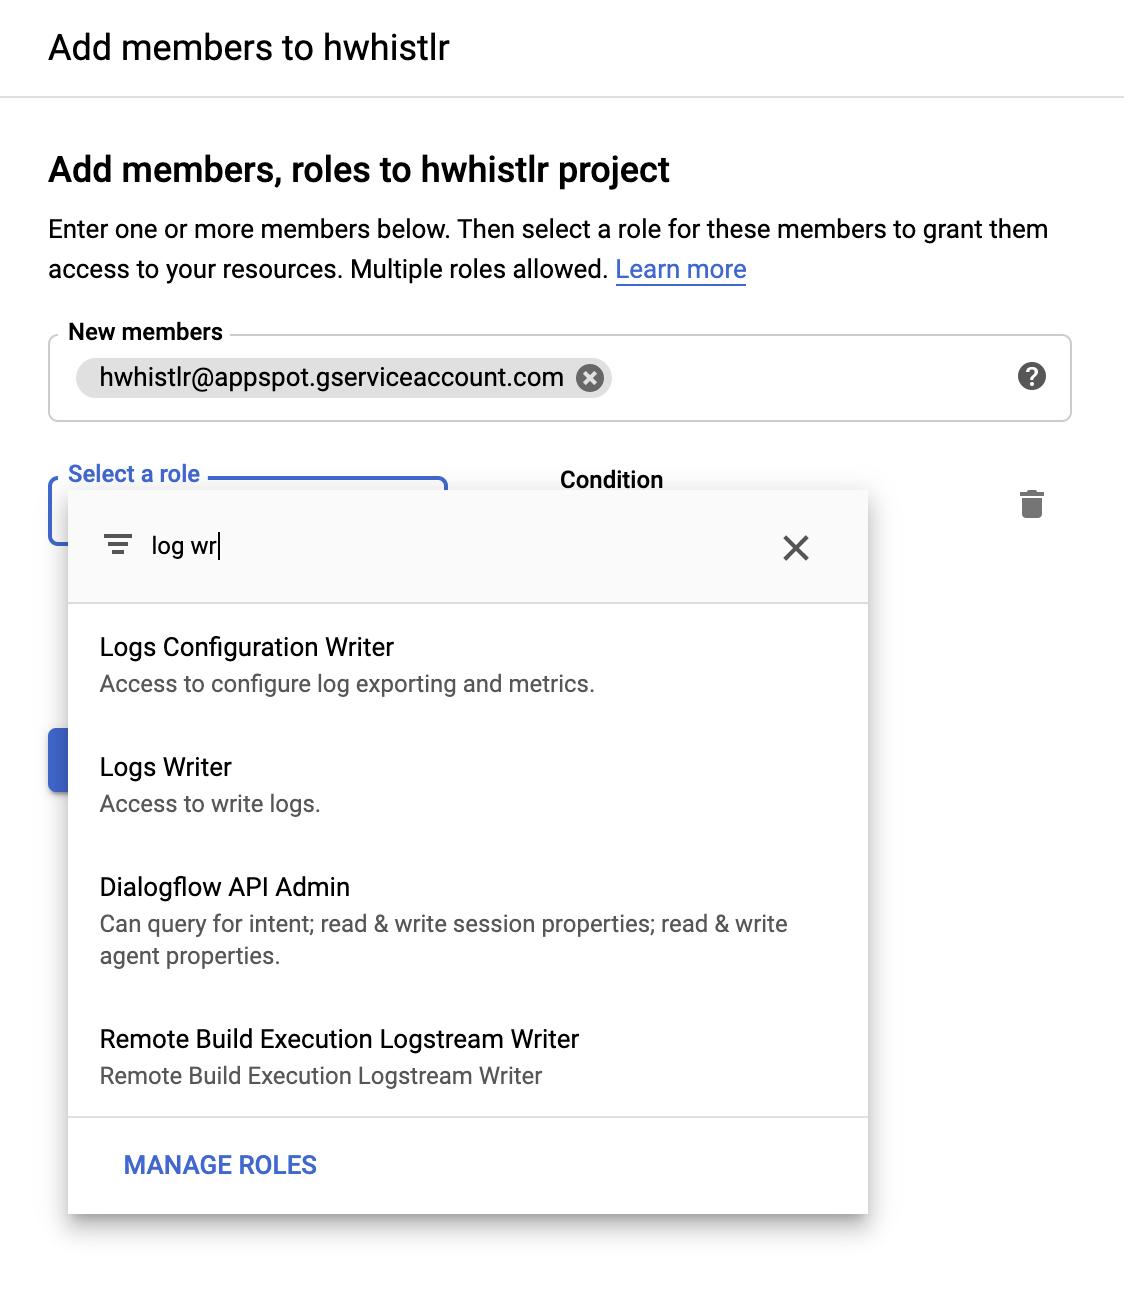 The Google Cloud IAM page